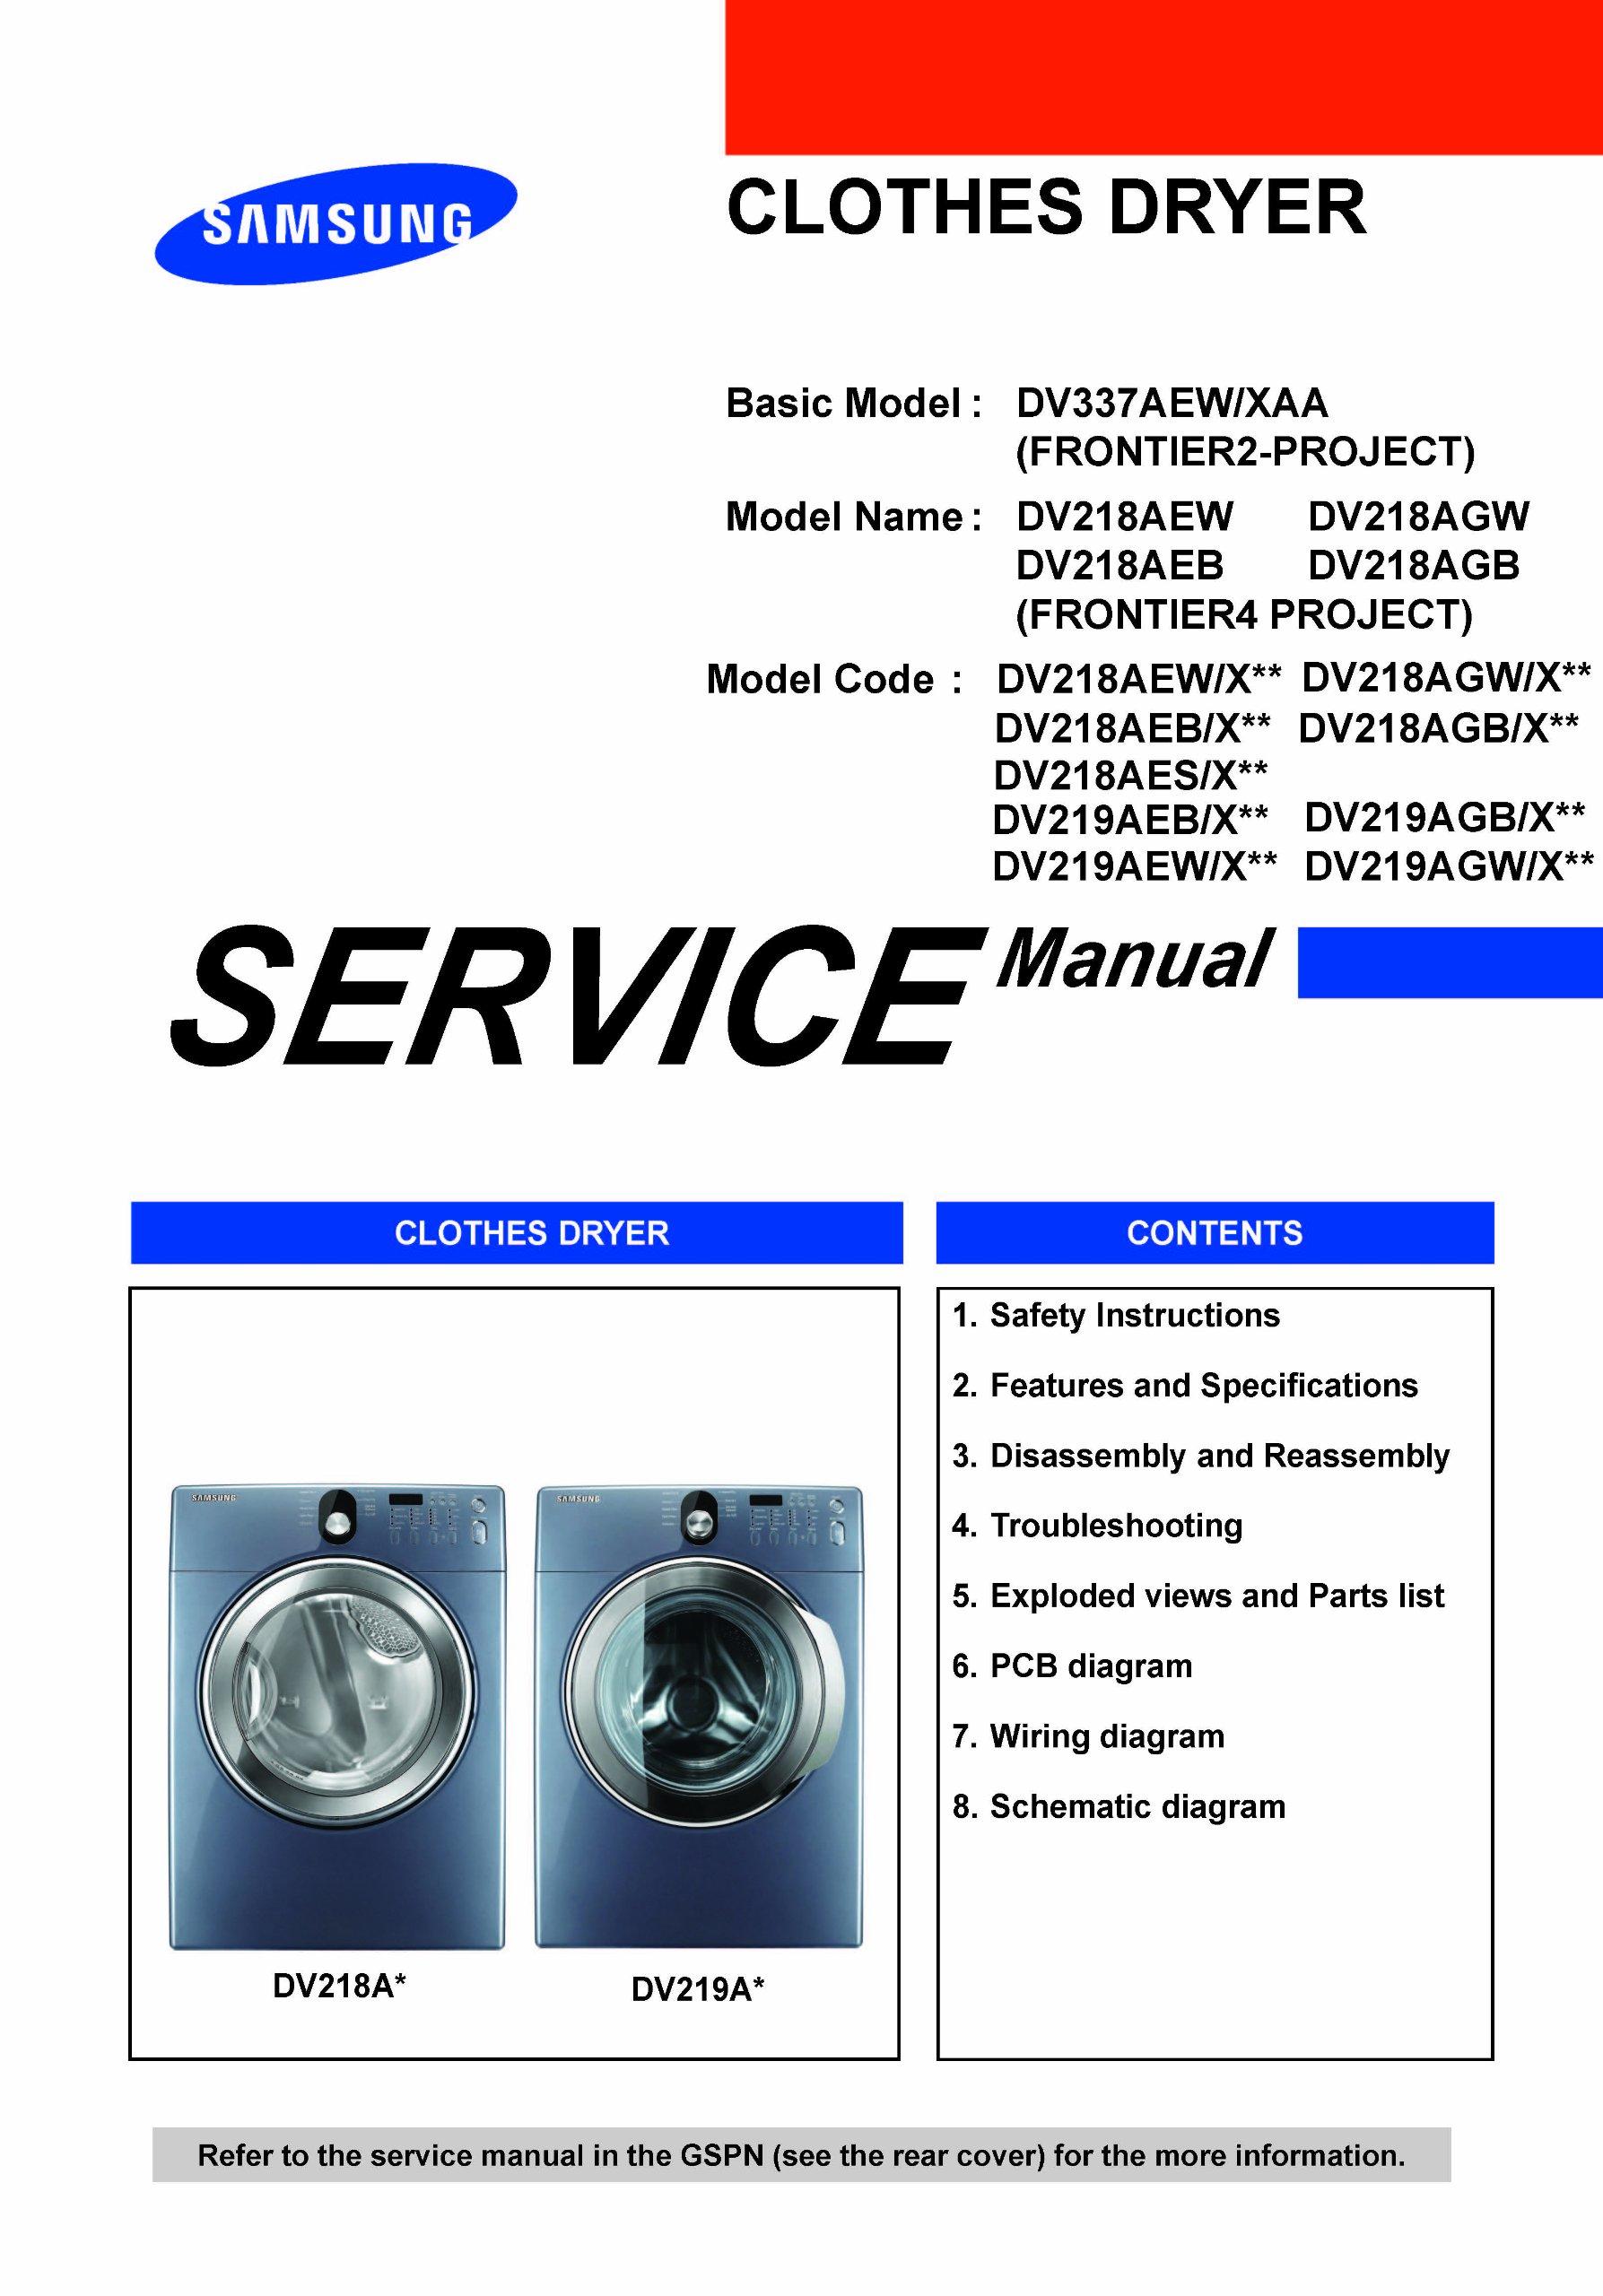 samsung dv219aew xaa service manua dv218aew xaa service manual rh amazon com Wiring Schematic Symbols Wiring Schematic Symbols